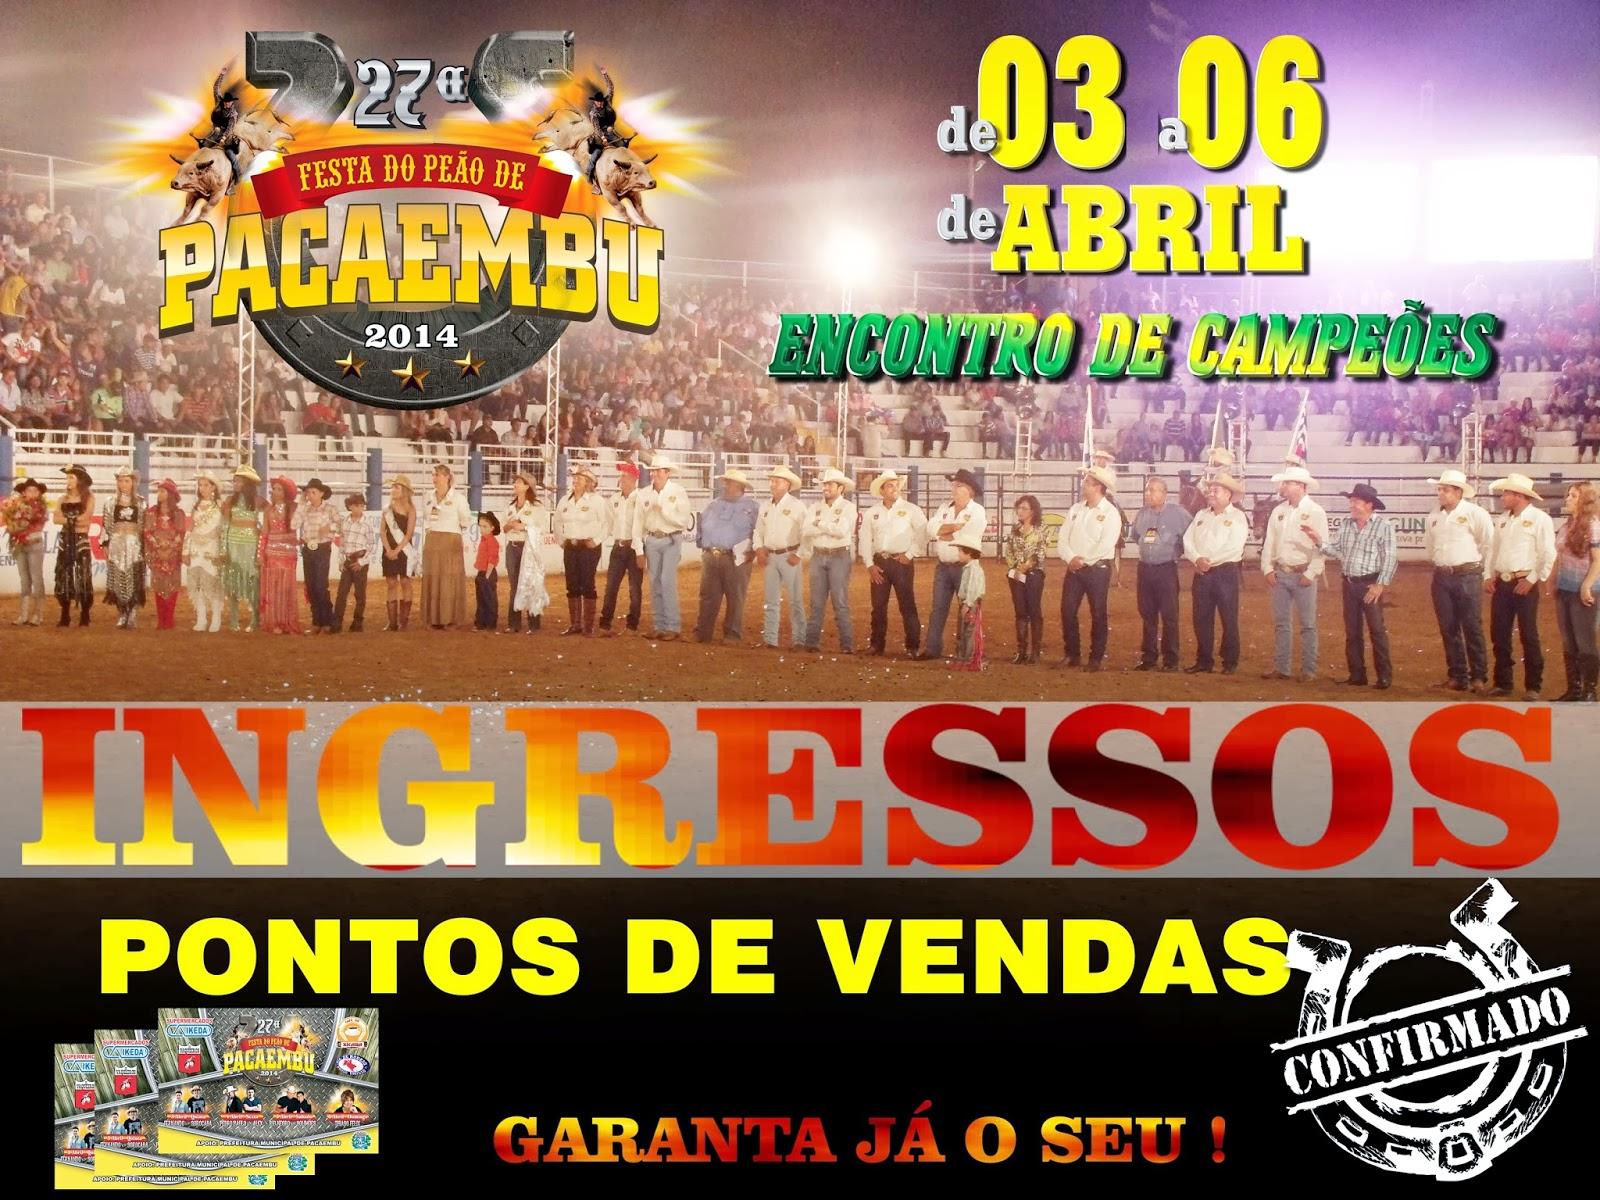 http://www.rodeiodepacaembu.com.br/p/blog-page_23.html